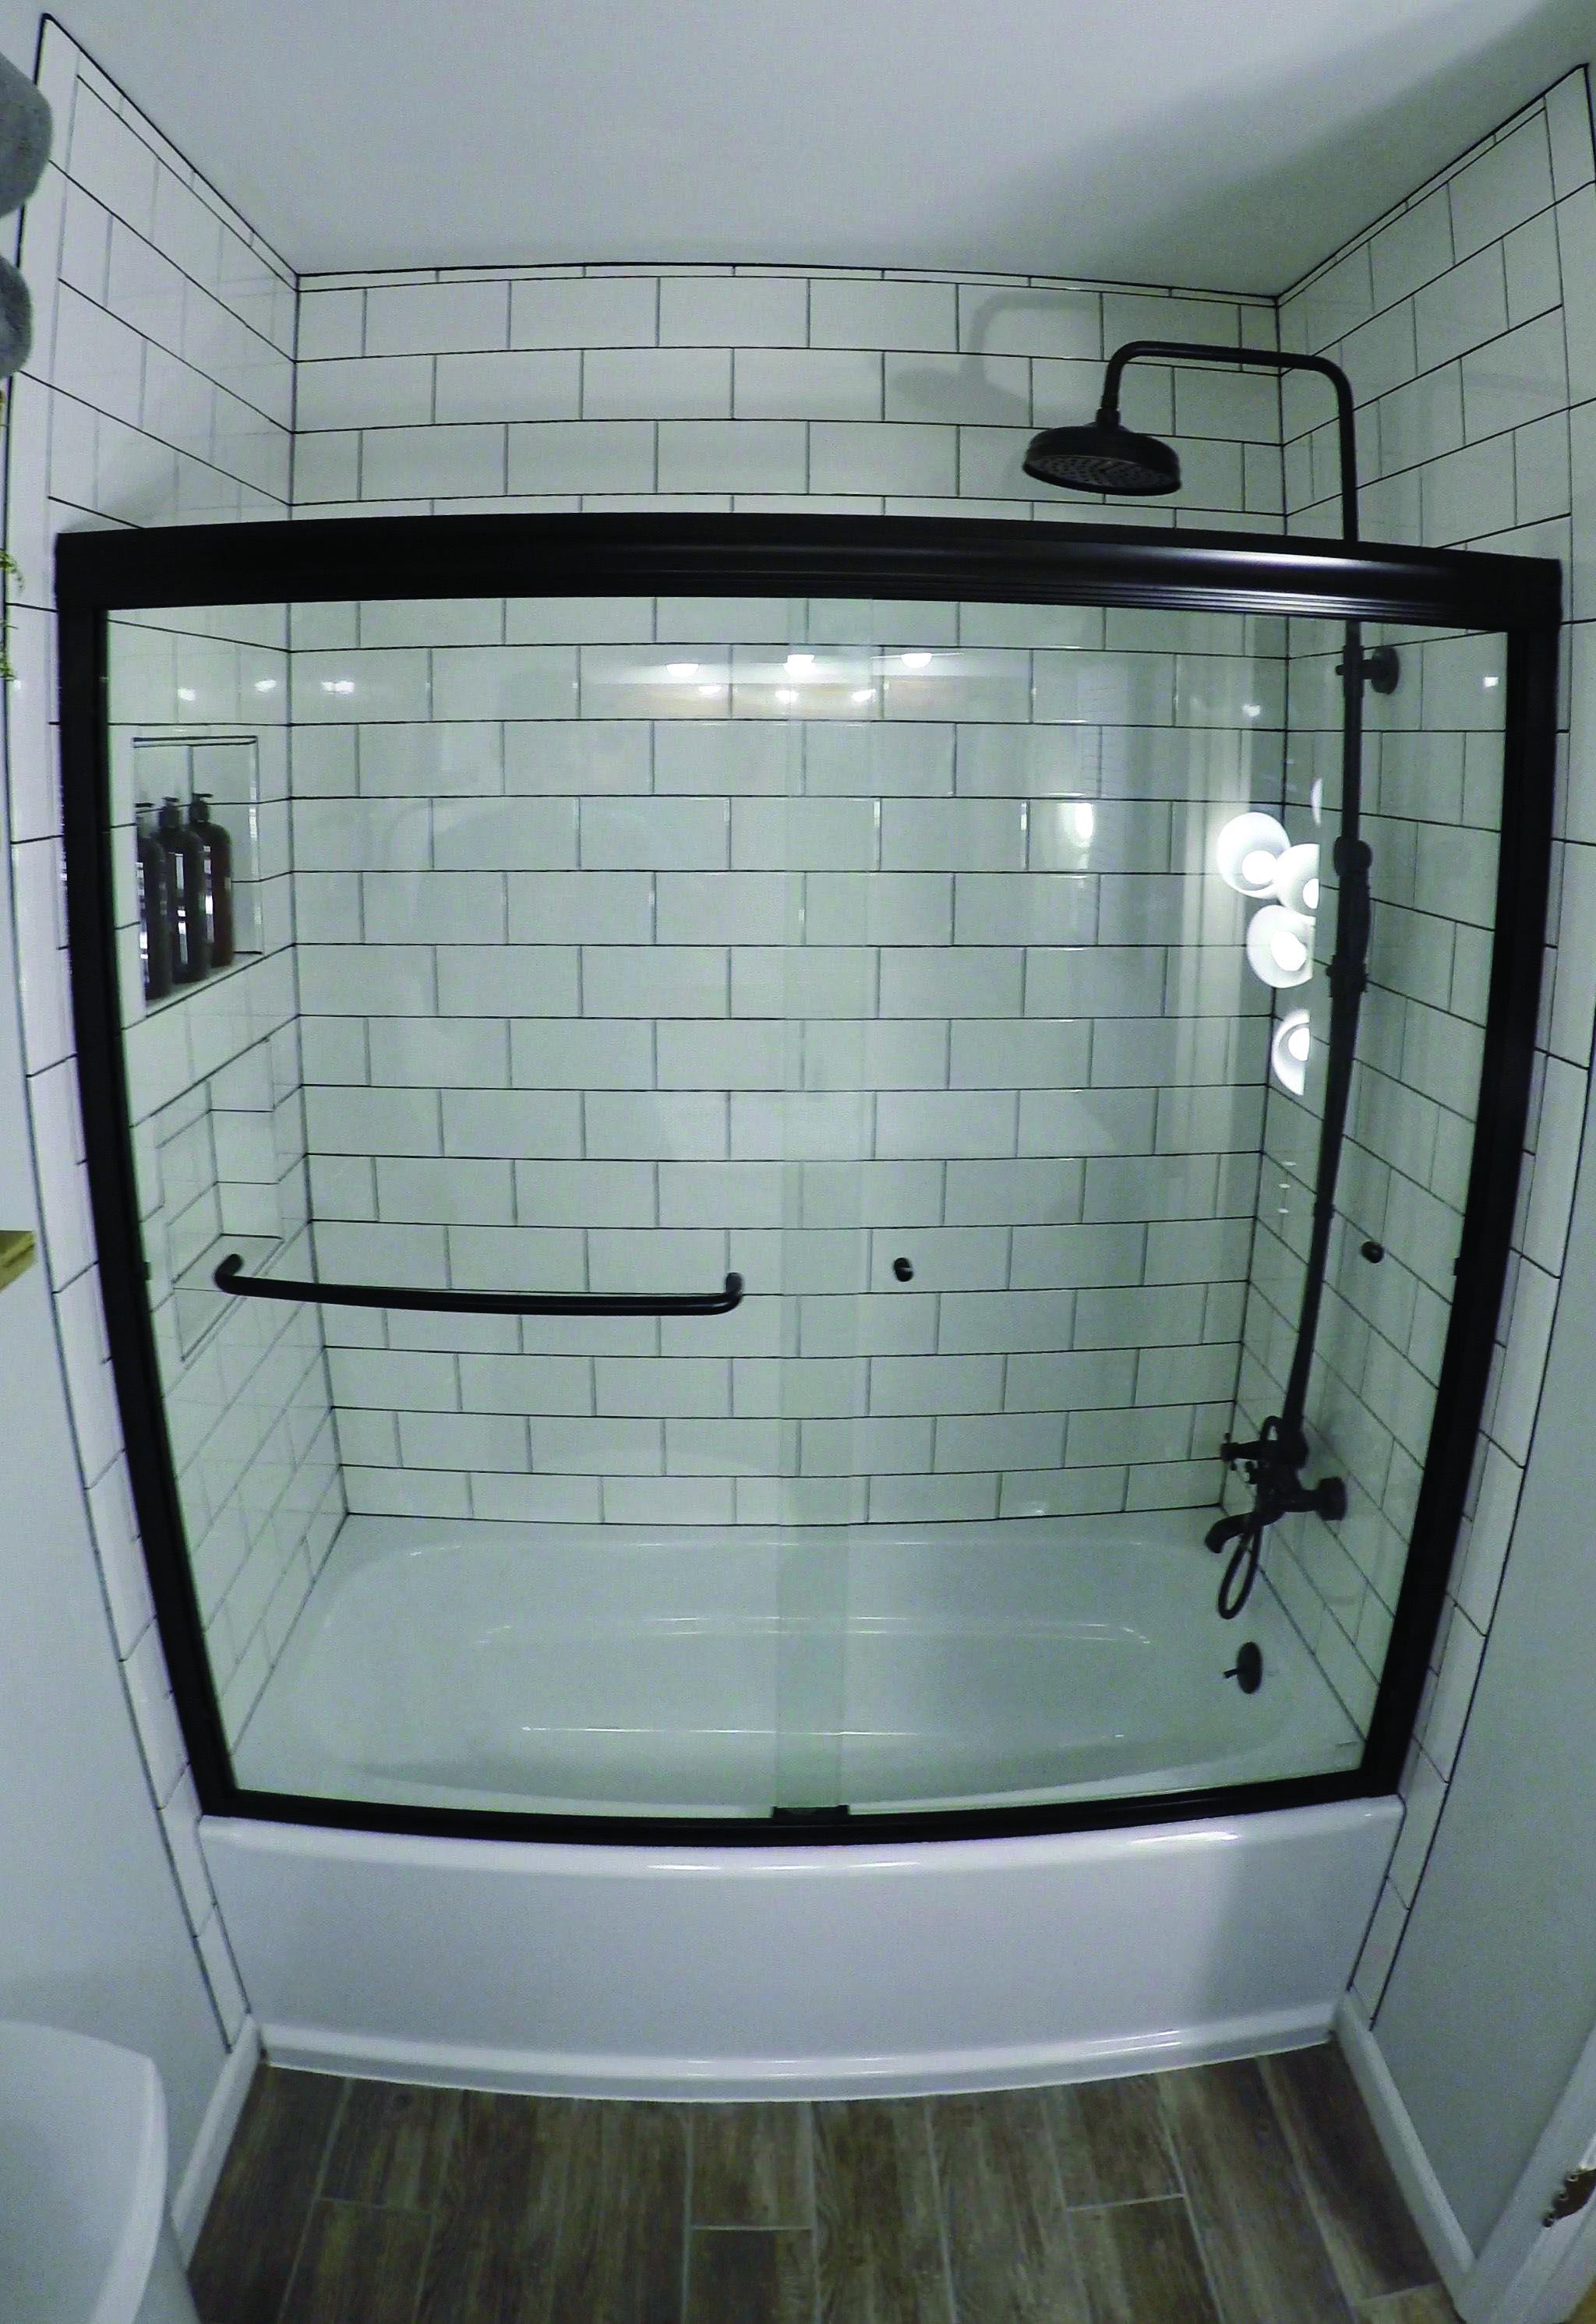 New Ways To Make Use Of Learn Flooring Ceramic Tile In Your Shower Room Dova Home Bathroom Tile Renovation Bathrooms Remodel Bathroom Renos